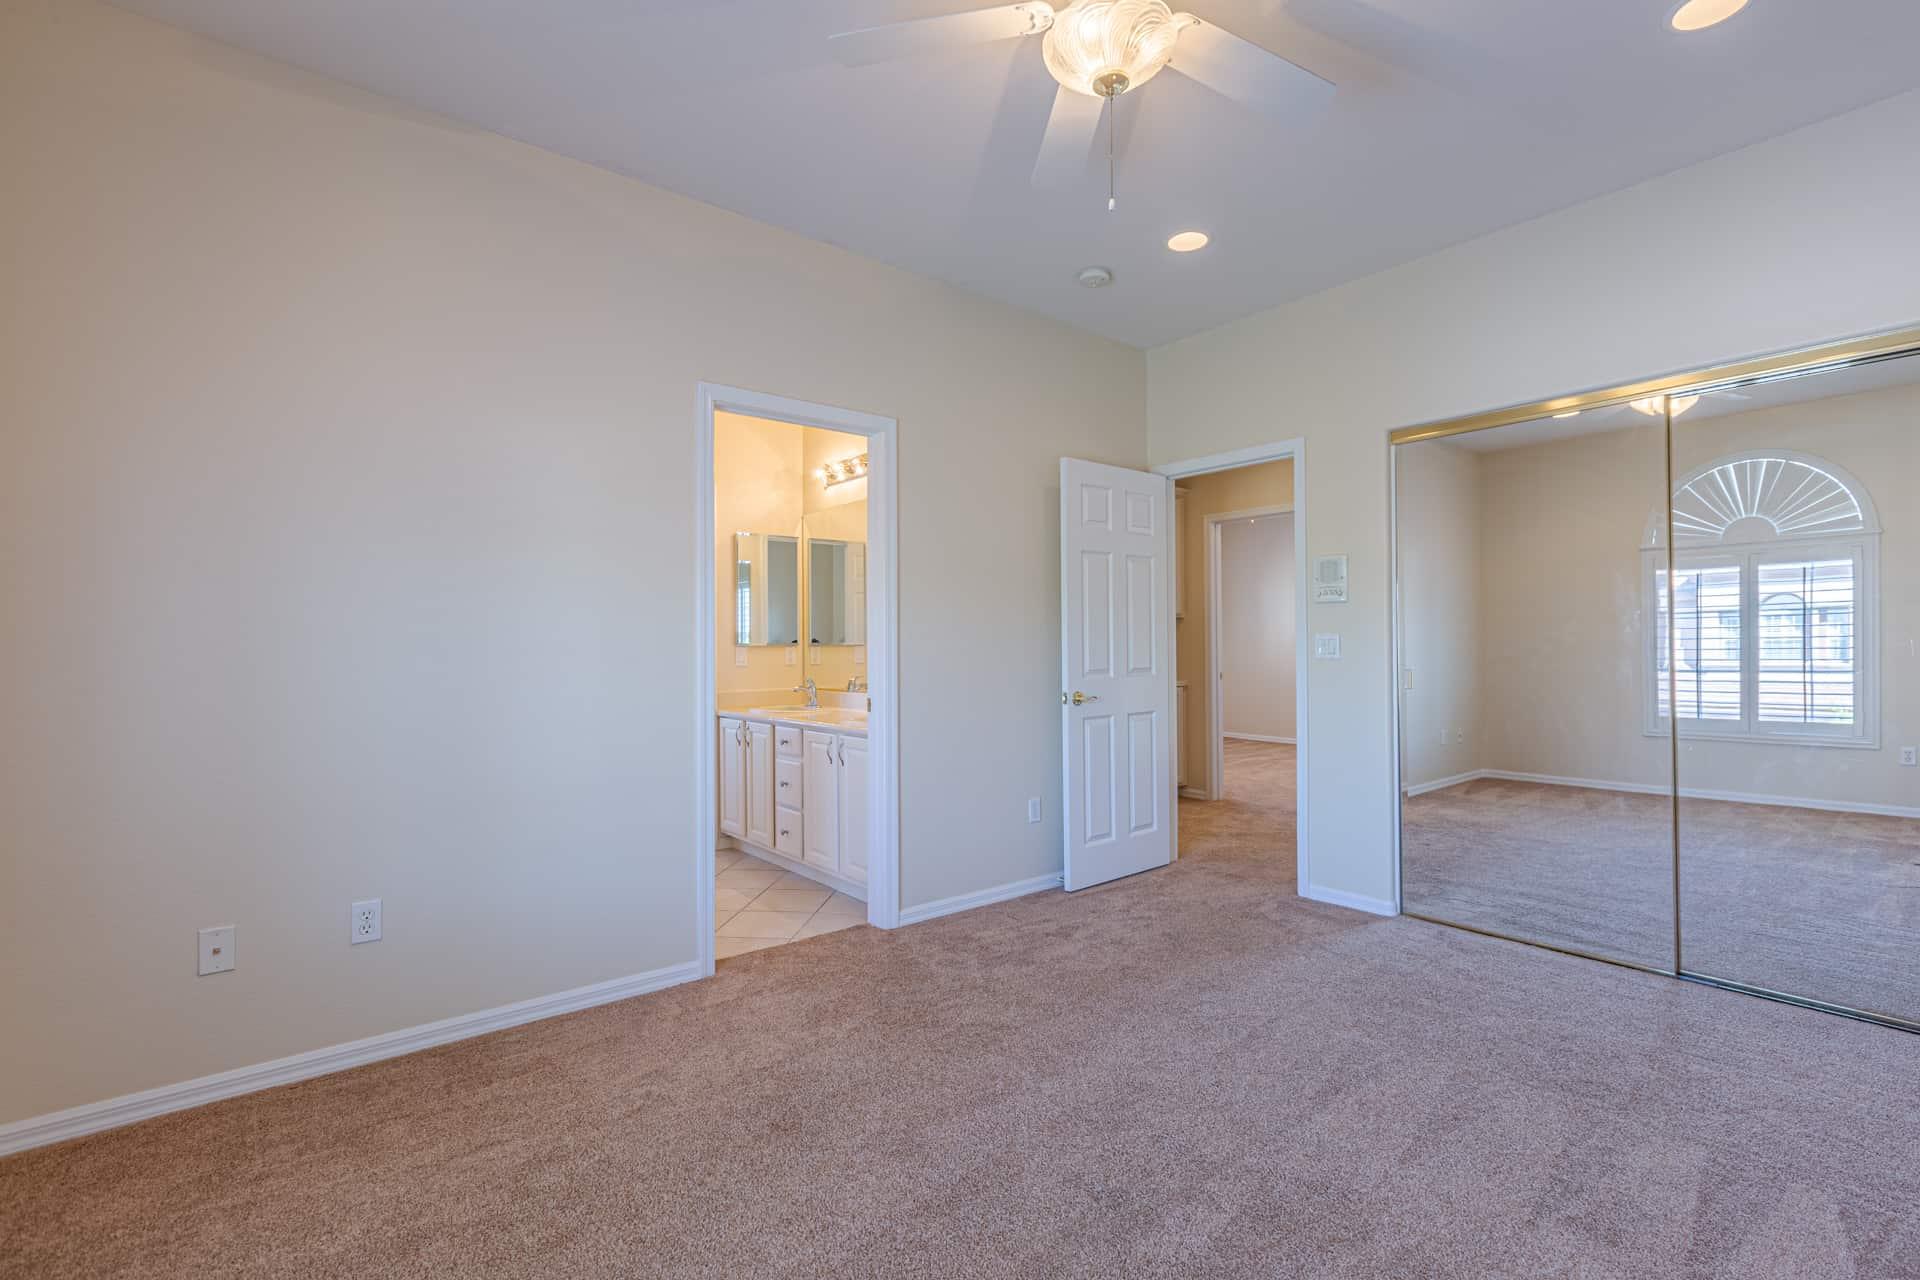 las-vegas-luxry-real-estate-realtor-rob-jensen-company-10729-grey-havens-court-willow-creek4657